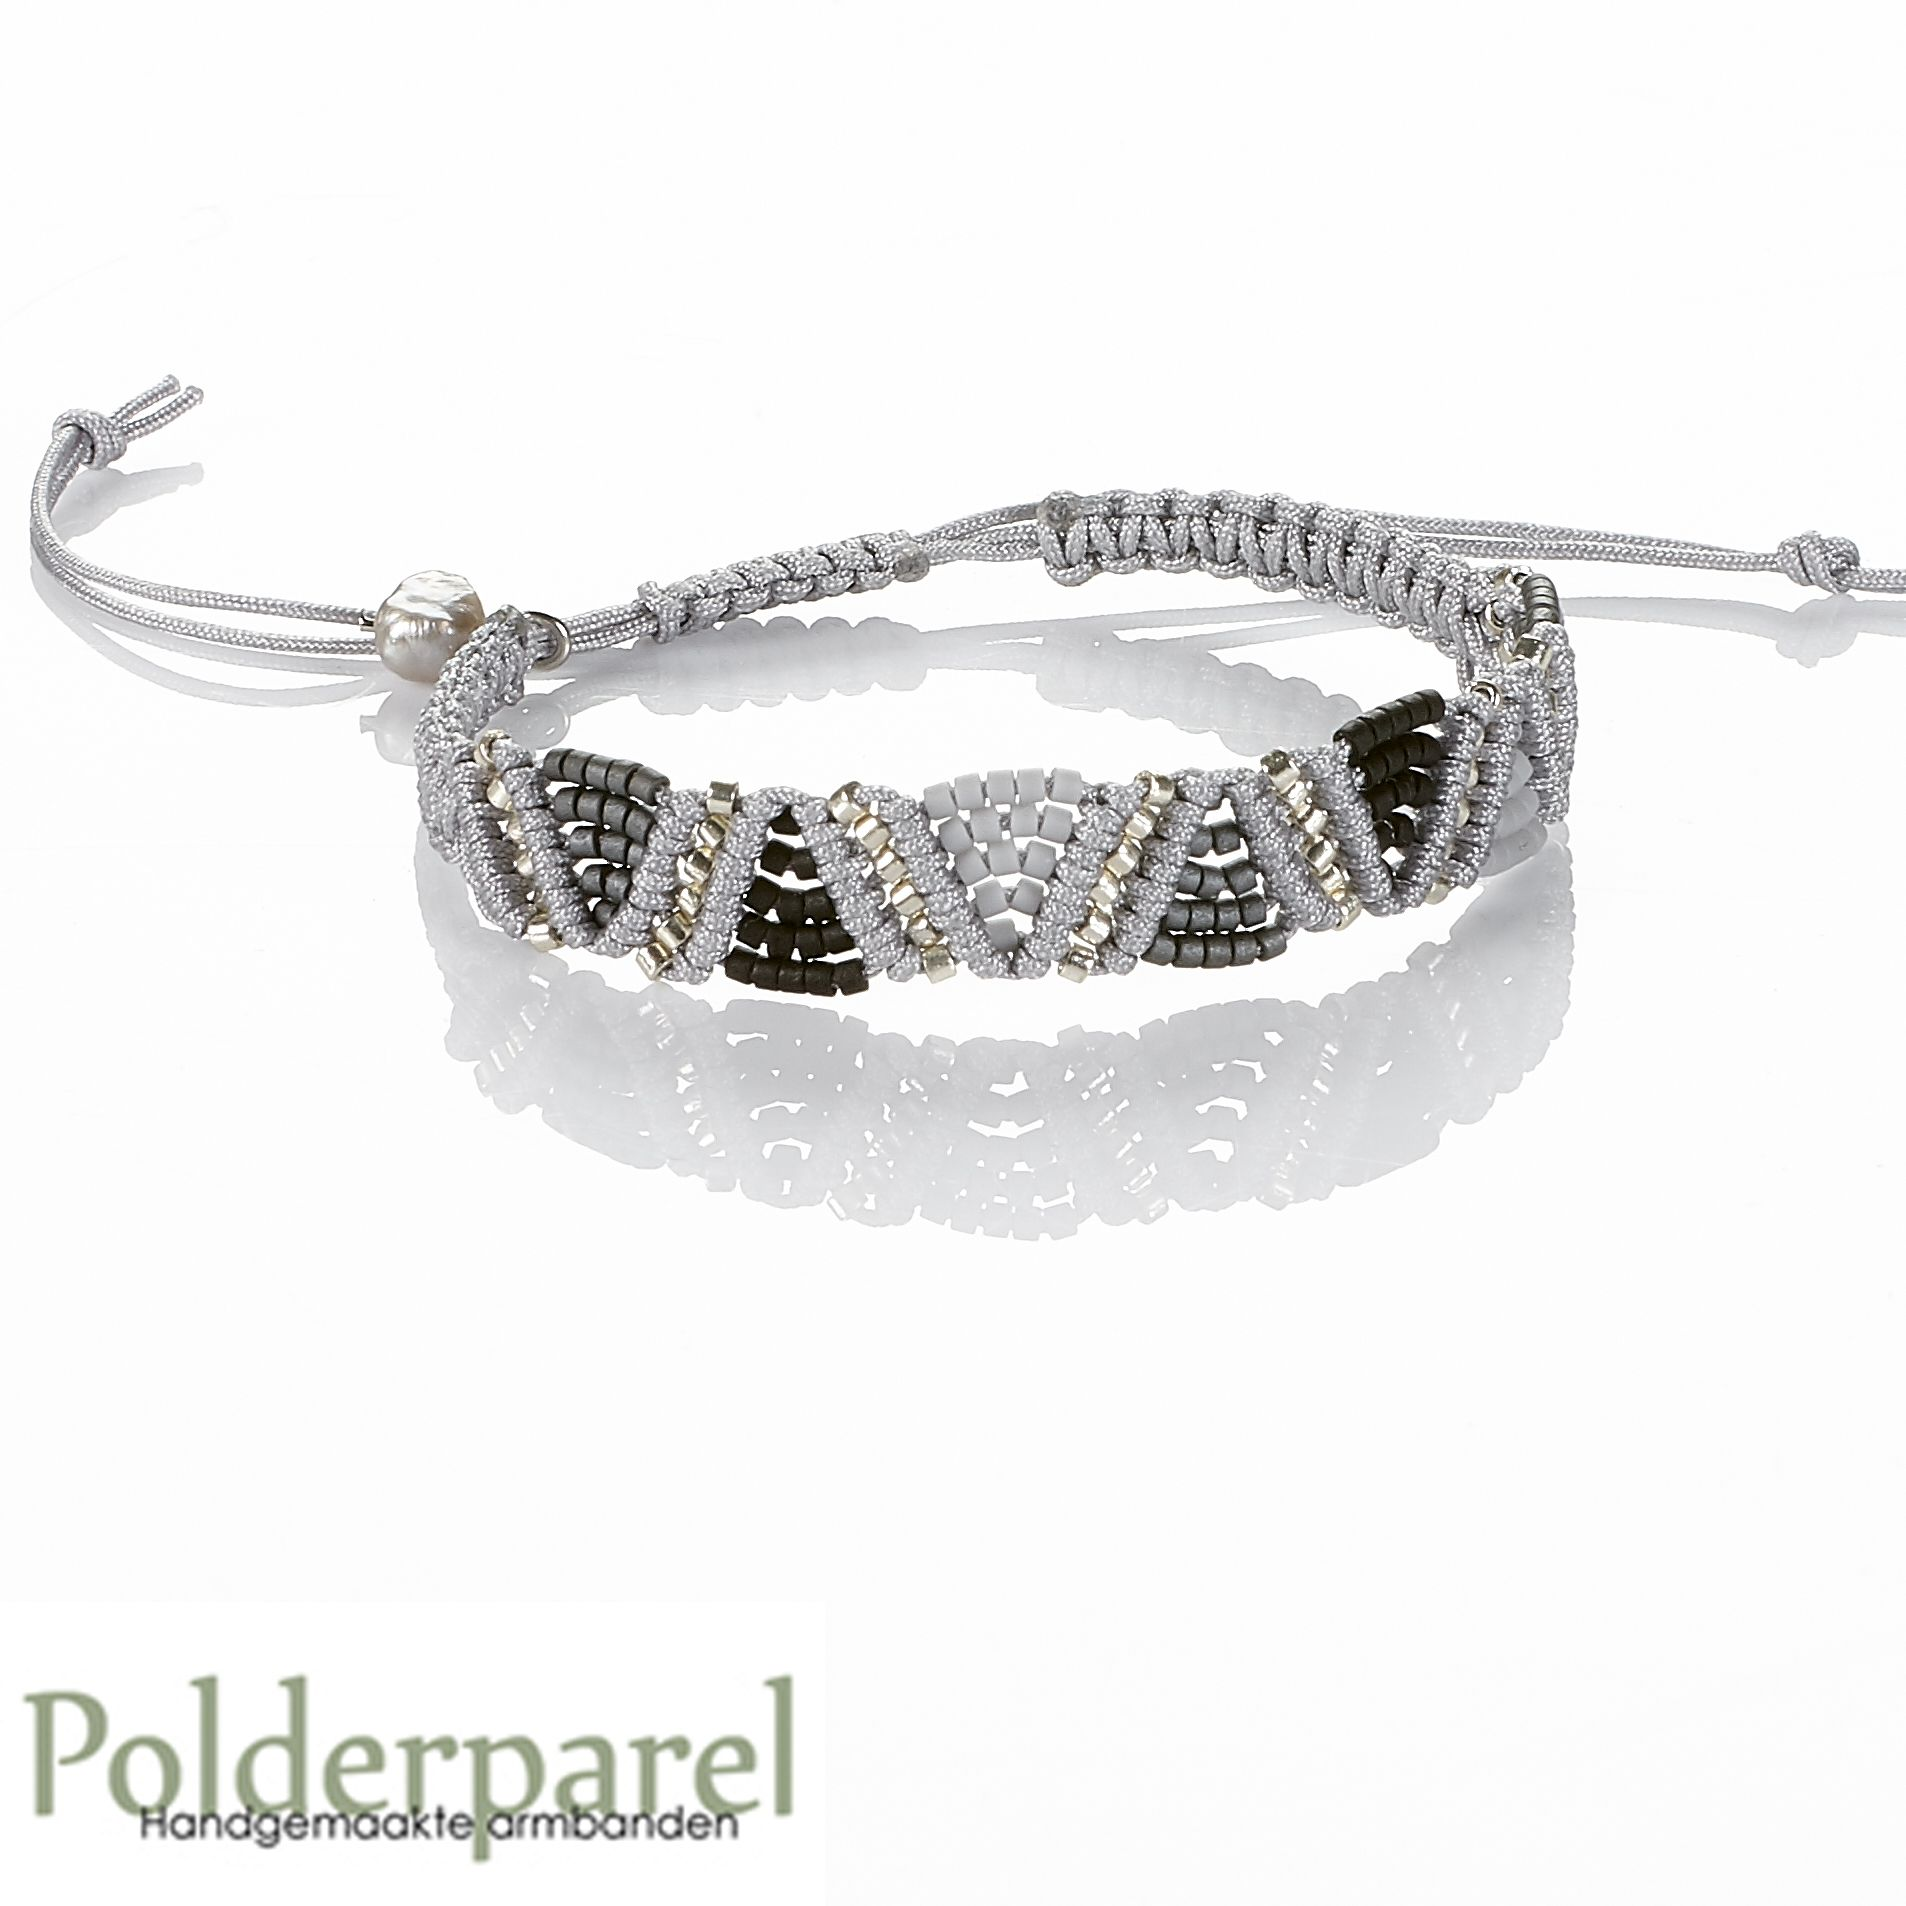 PPN1603 Polderparel armbanden Online bestellen Armband